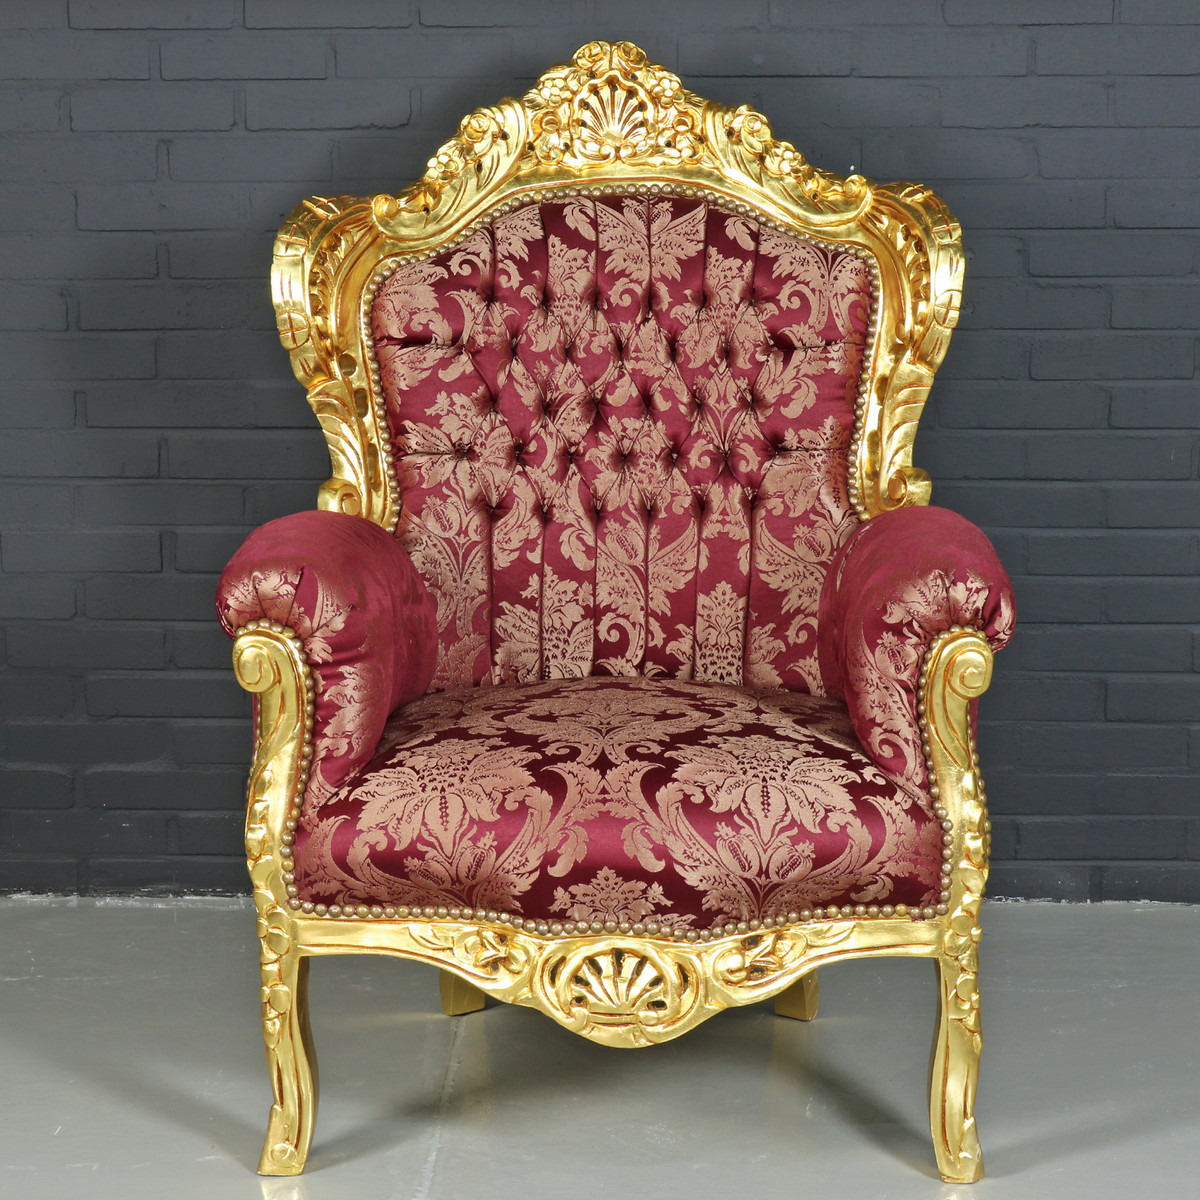 casa padrino barock sessel king bordeaux rot muster gold antik stil m bel sessel barock. Black Bedroom Furniture Sets. Home Design Ideas